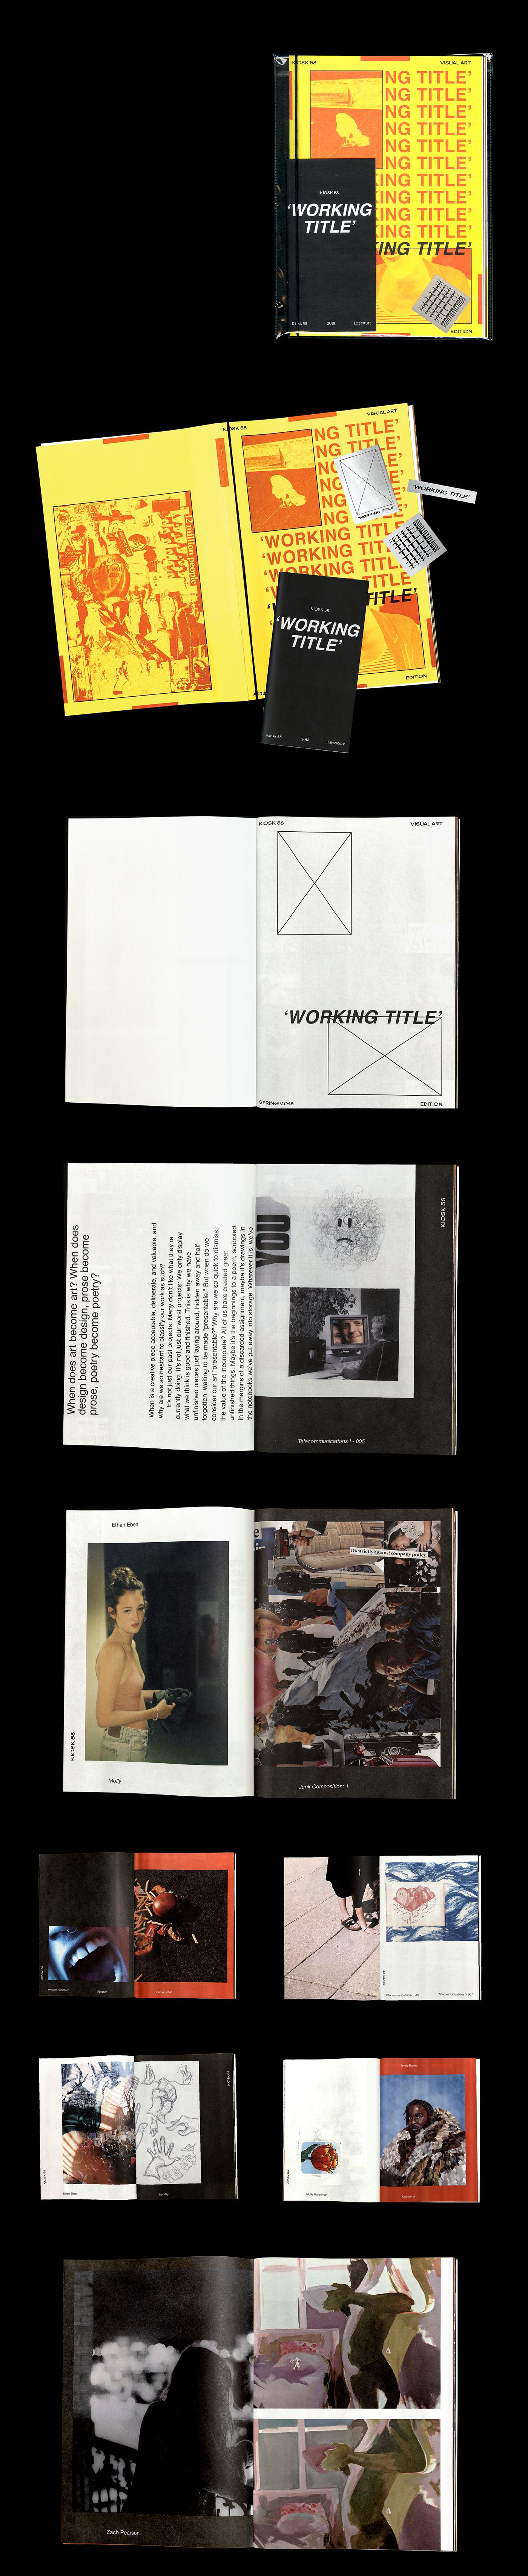 Kiosk Working Title KU Design editorial magazine university of kansas art Poetry  design